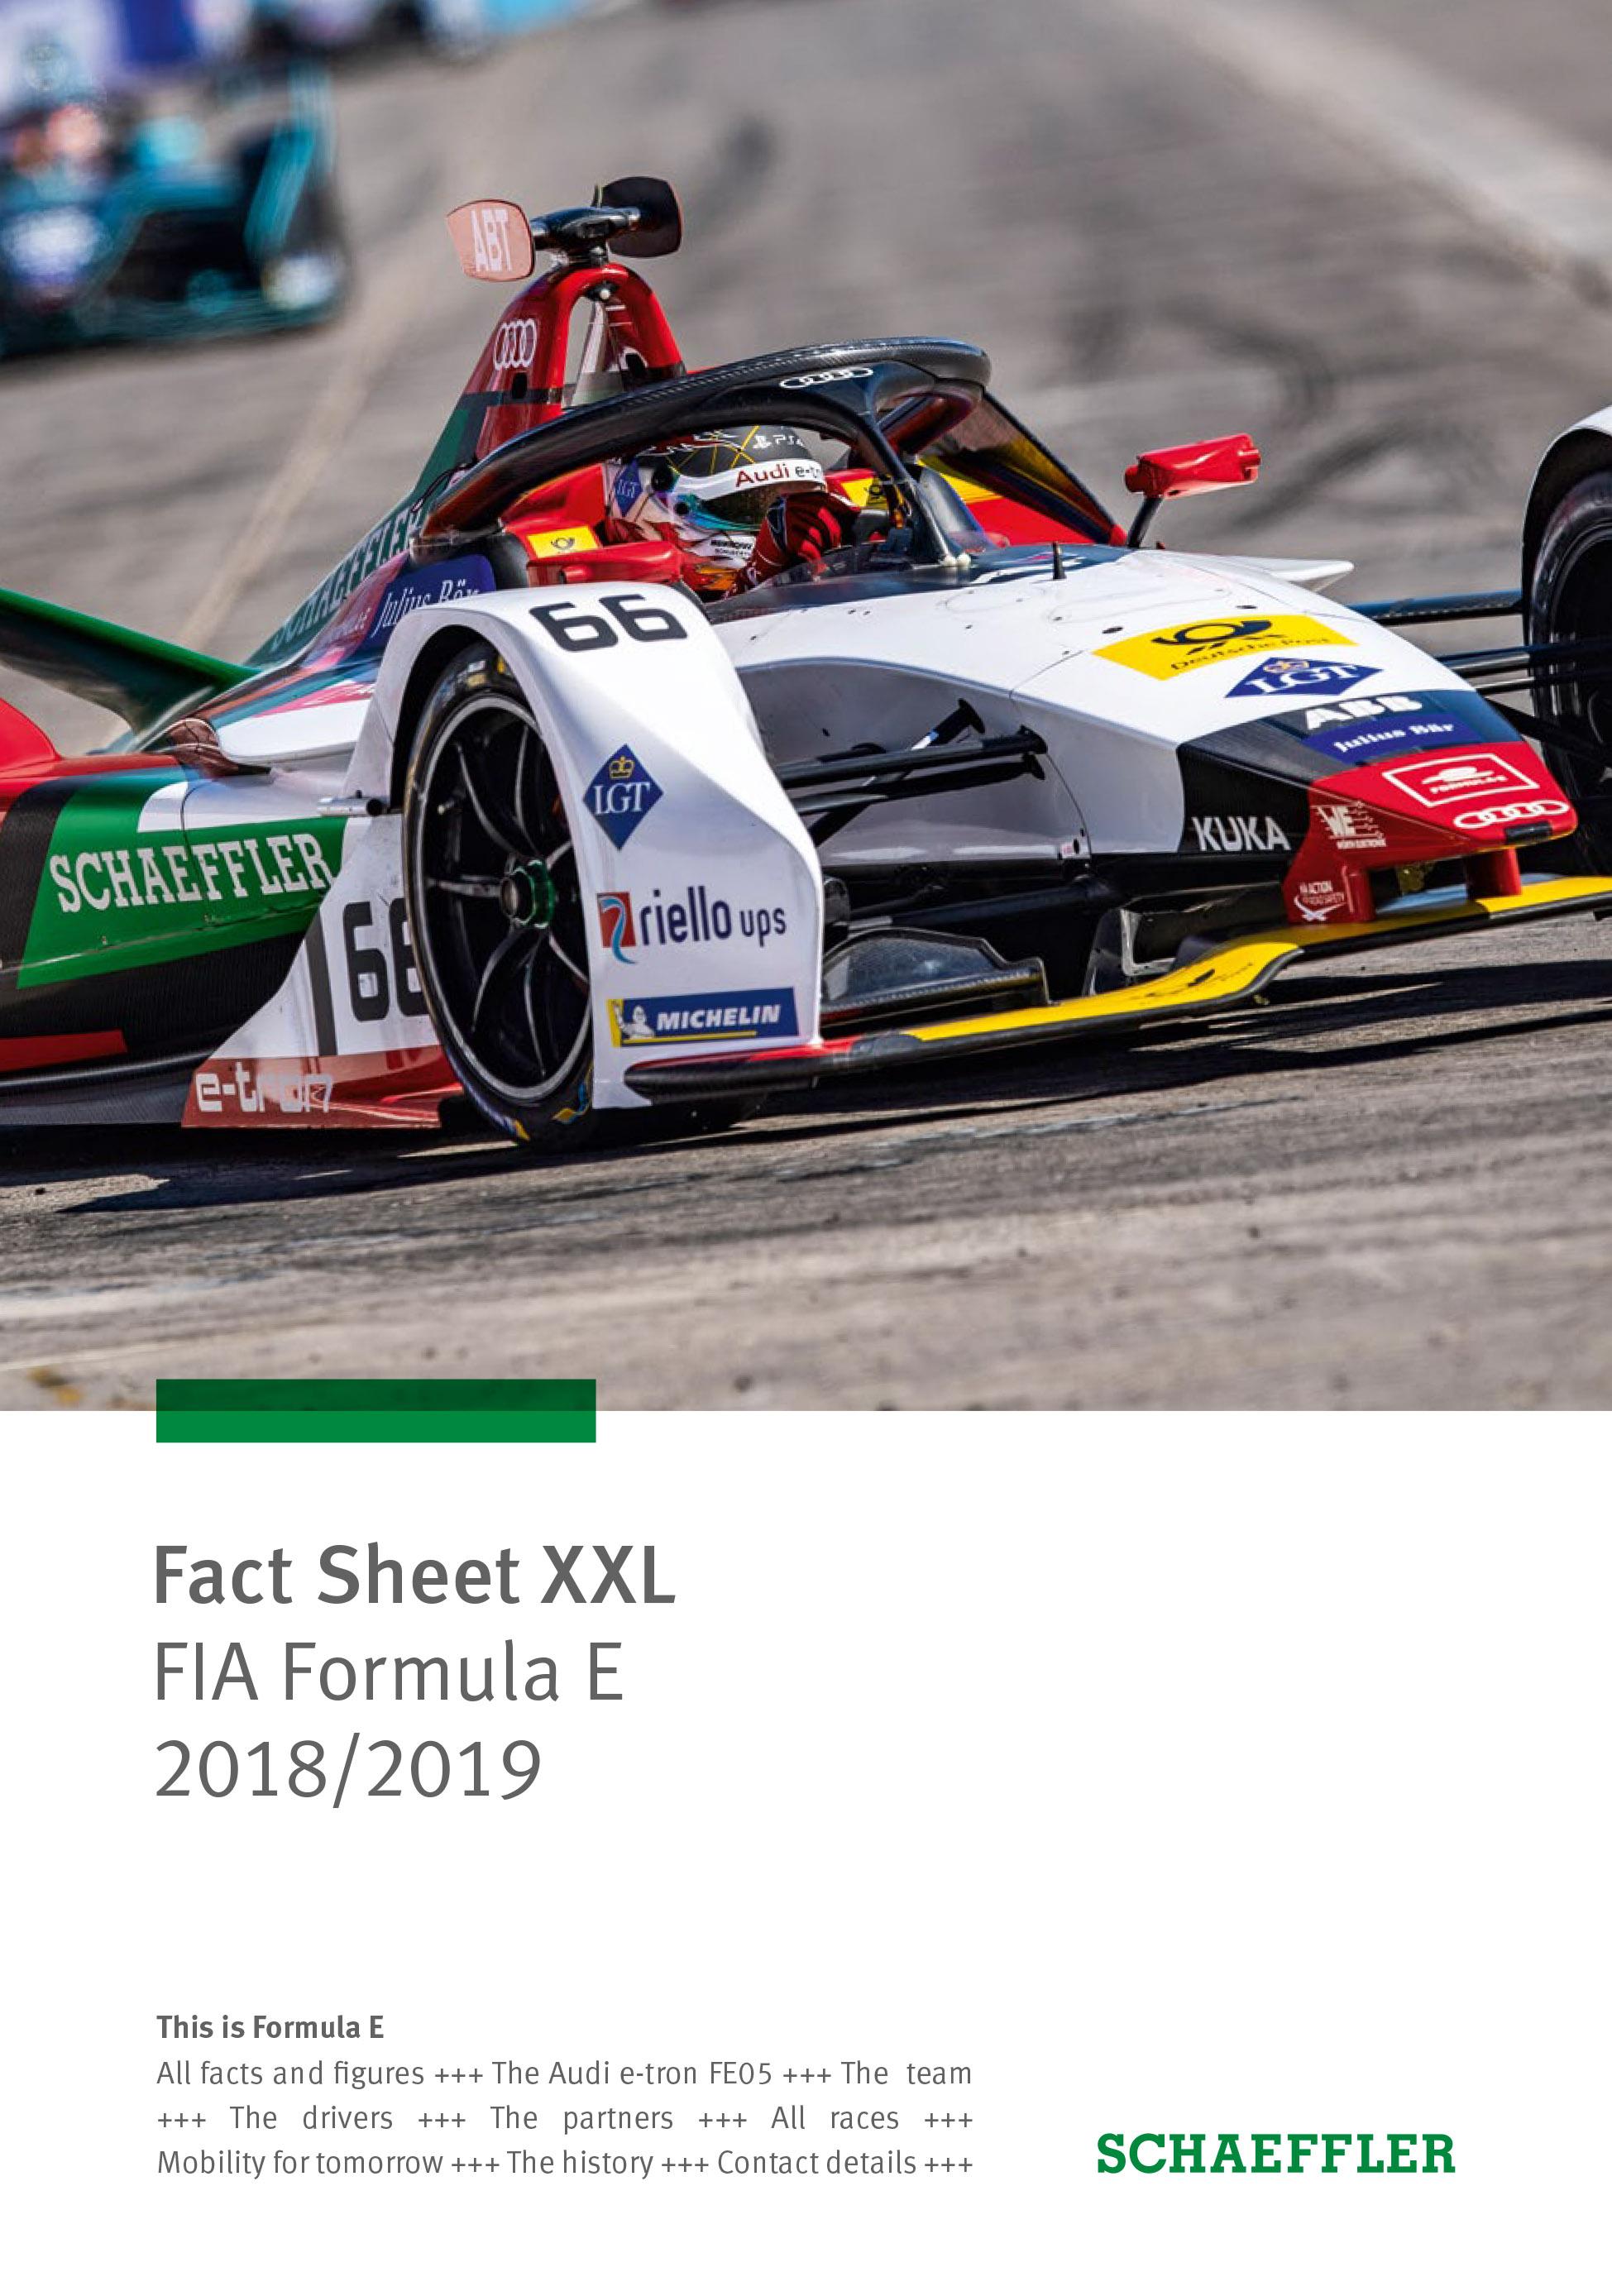 Schaeffler in motorsport: ABB FIA Formula E electric racing